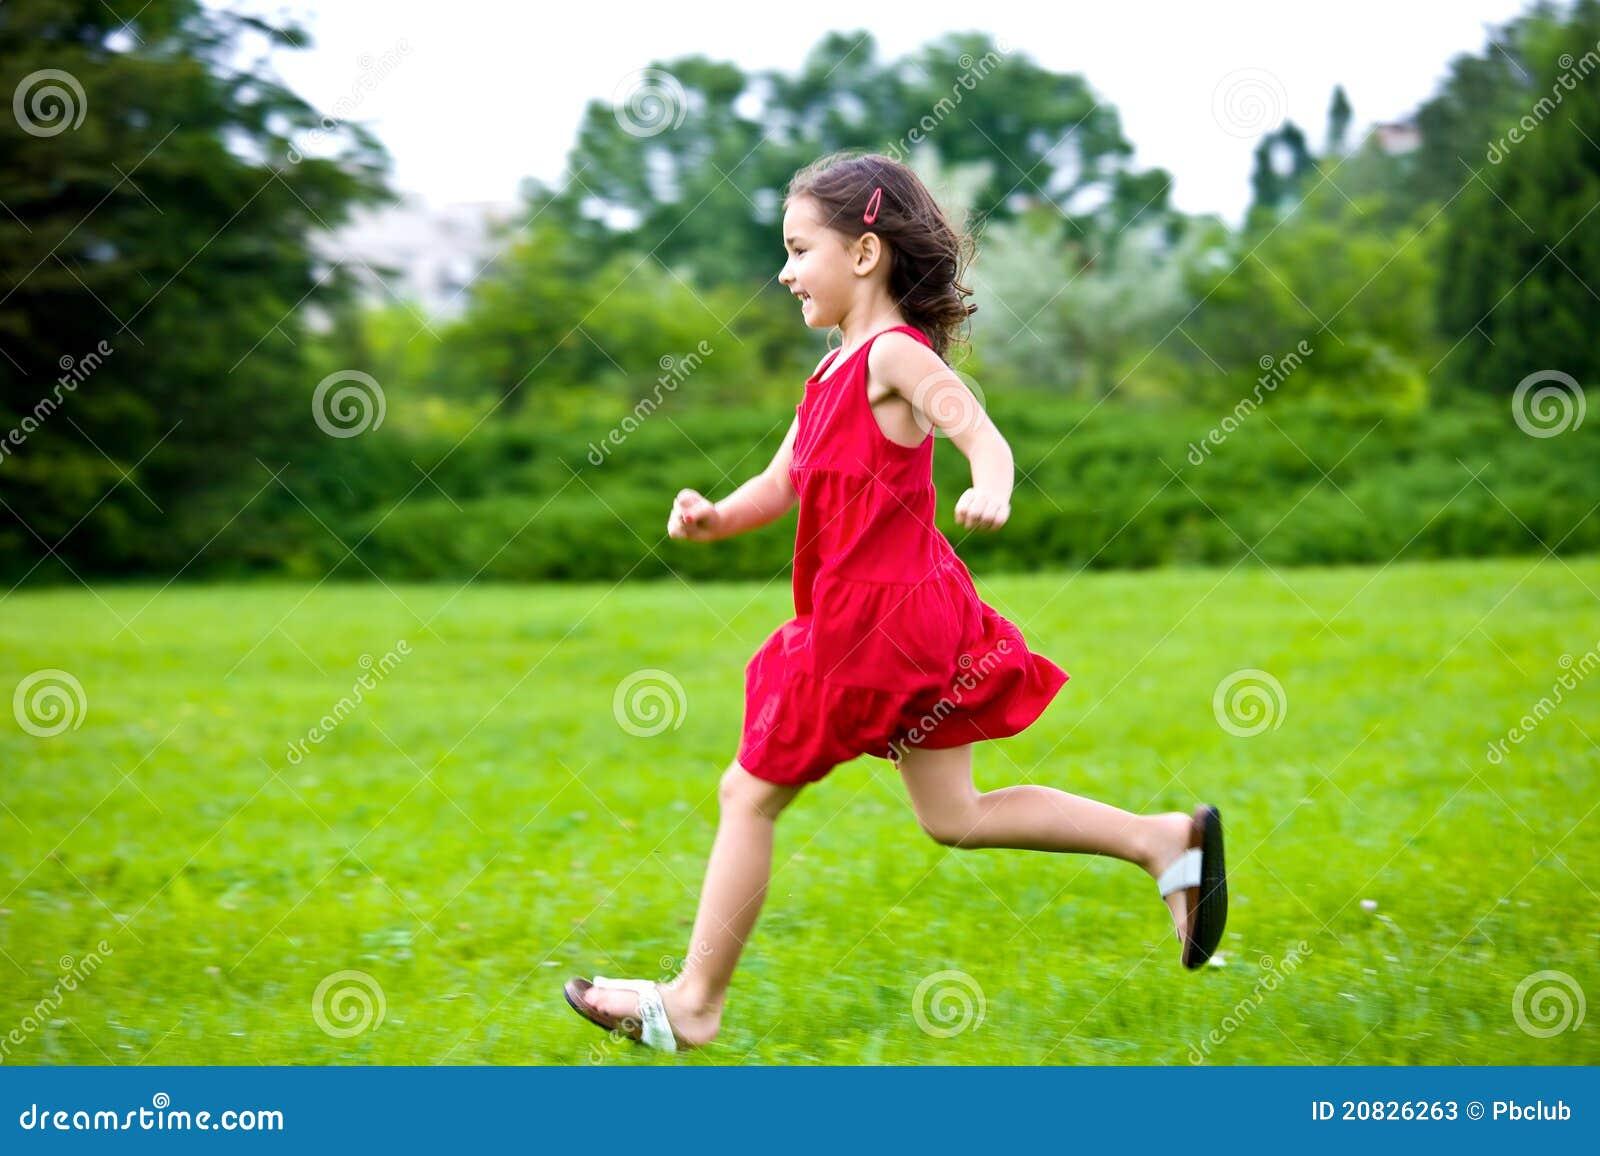 Baby Girl Running